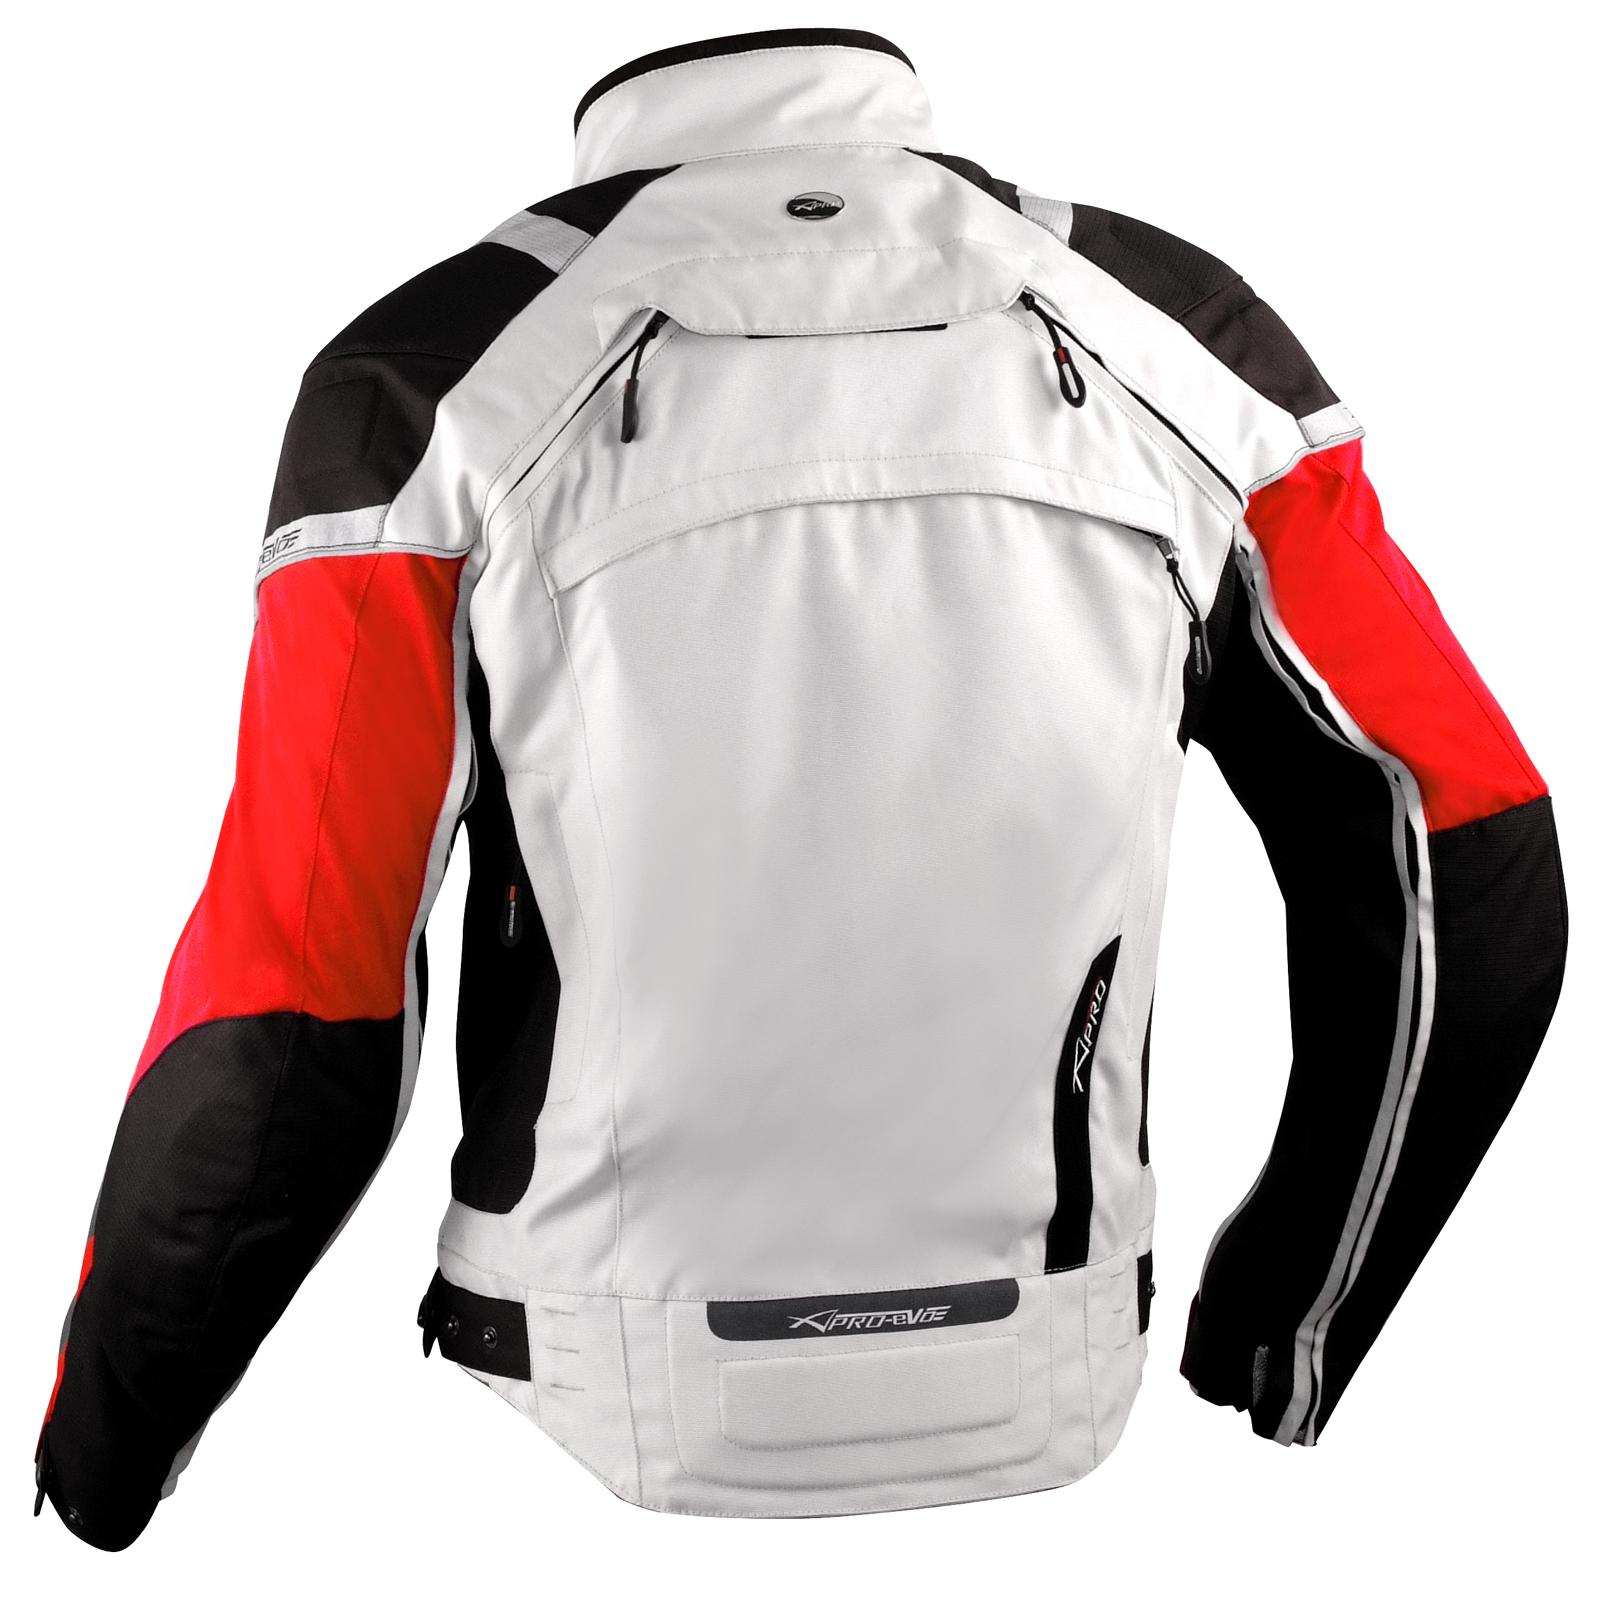 Giacca-Moto-Tessuto-Cordura-Mesh-Protezioni-CE-Impermeabile-4-Stagioni-Bianco